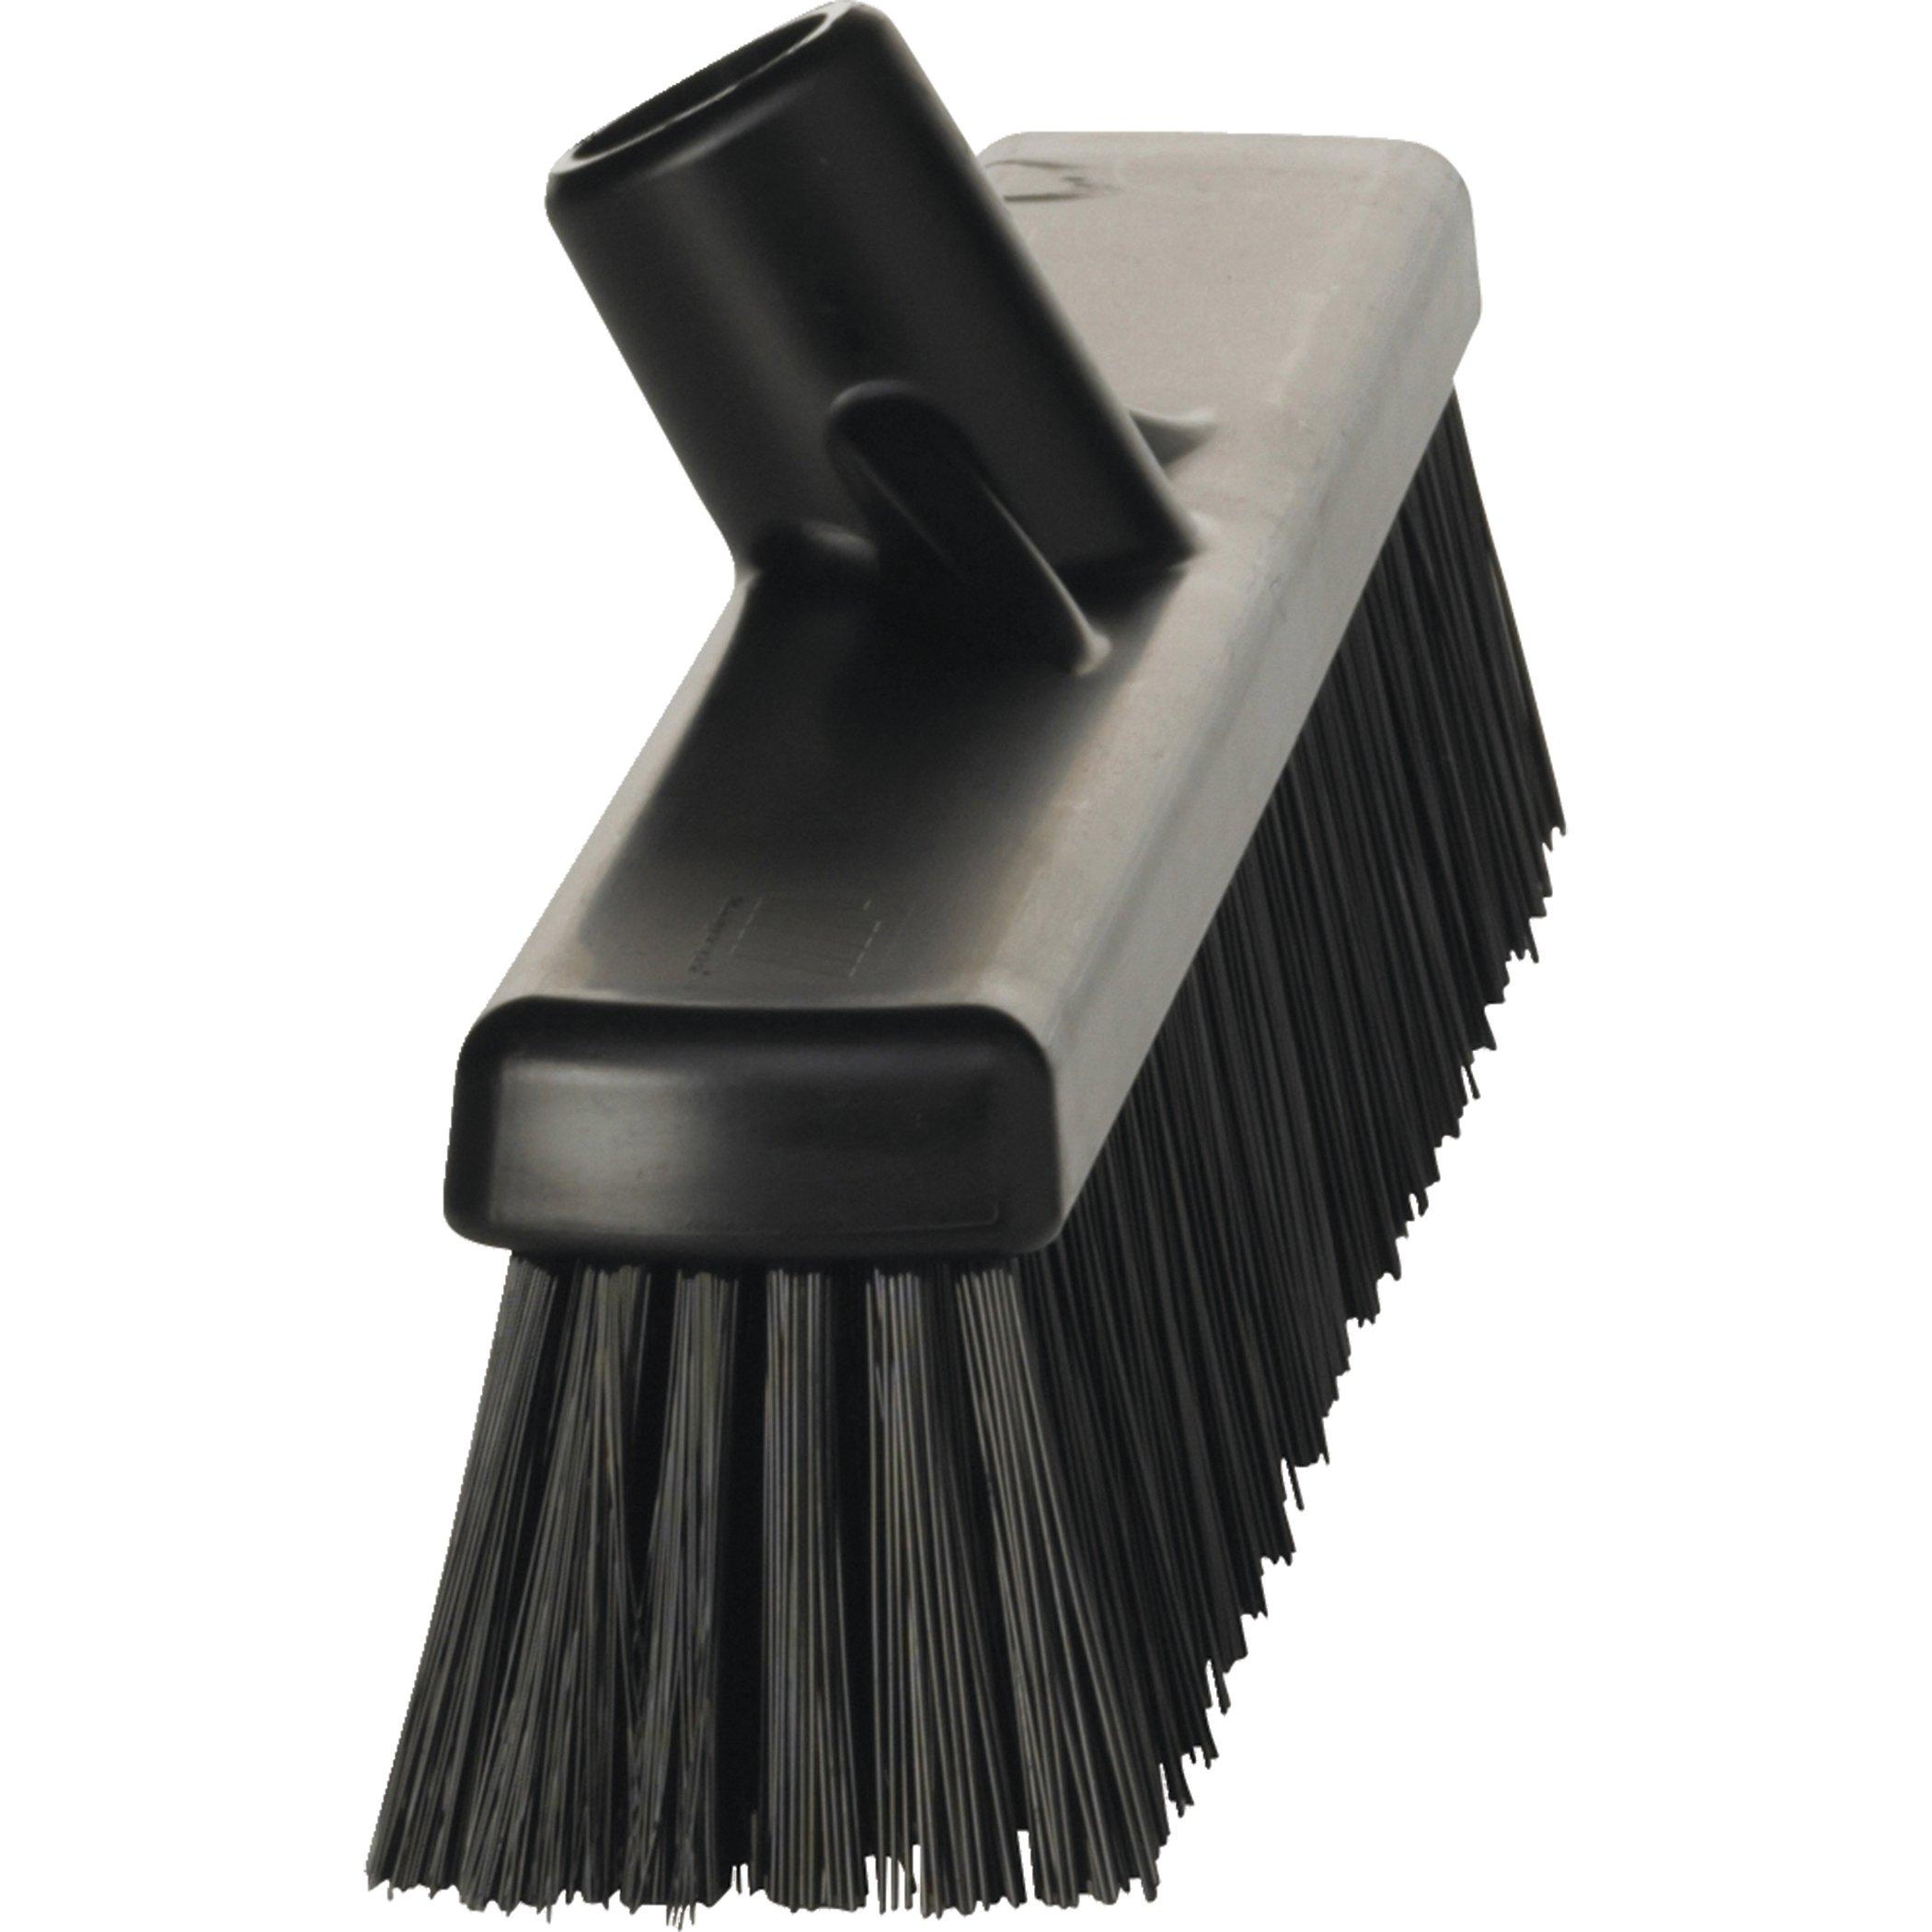 Vikan 31749 Coarse/Fine Sweep Floor Broom Head, Polypropylene Block, 16-1/2 Polyester Bristle, Black